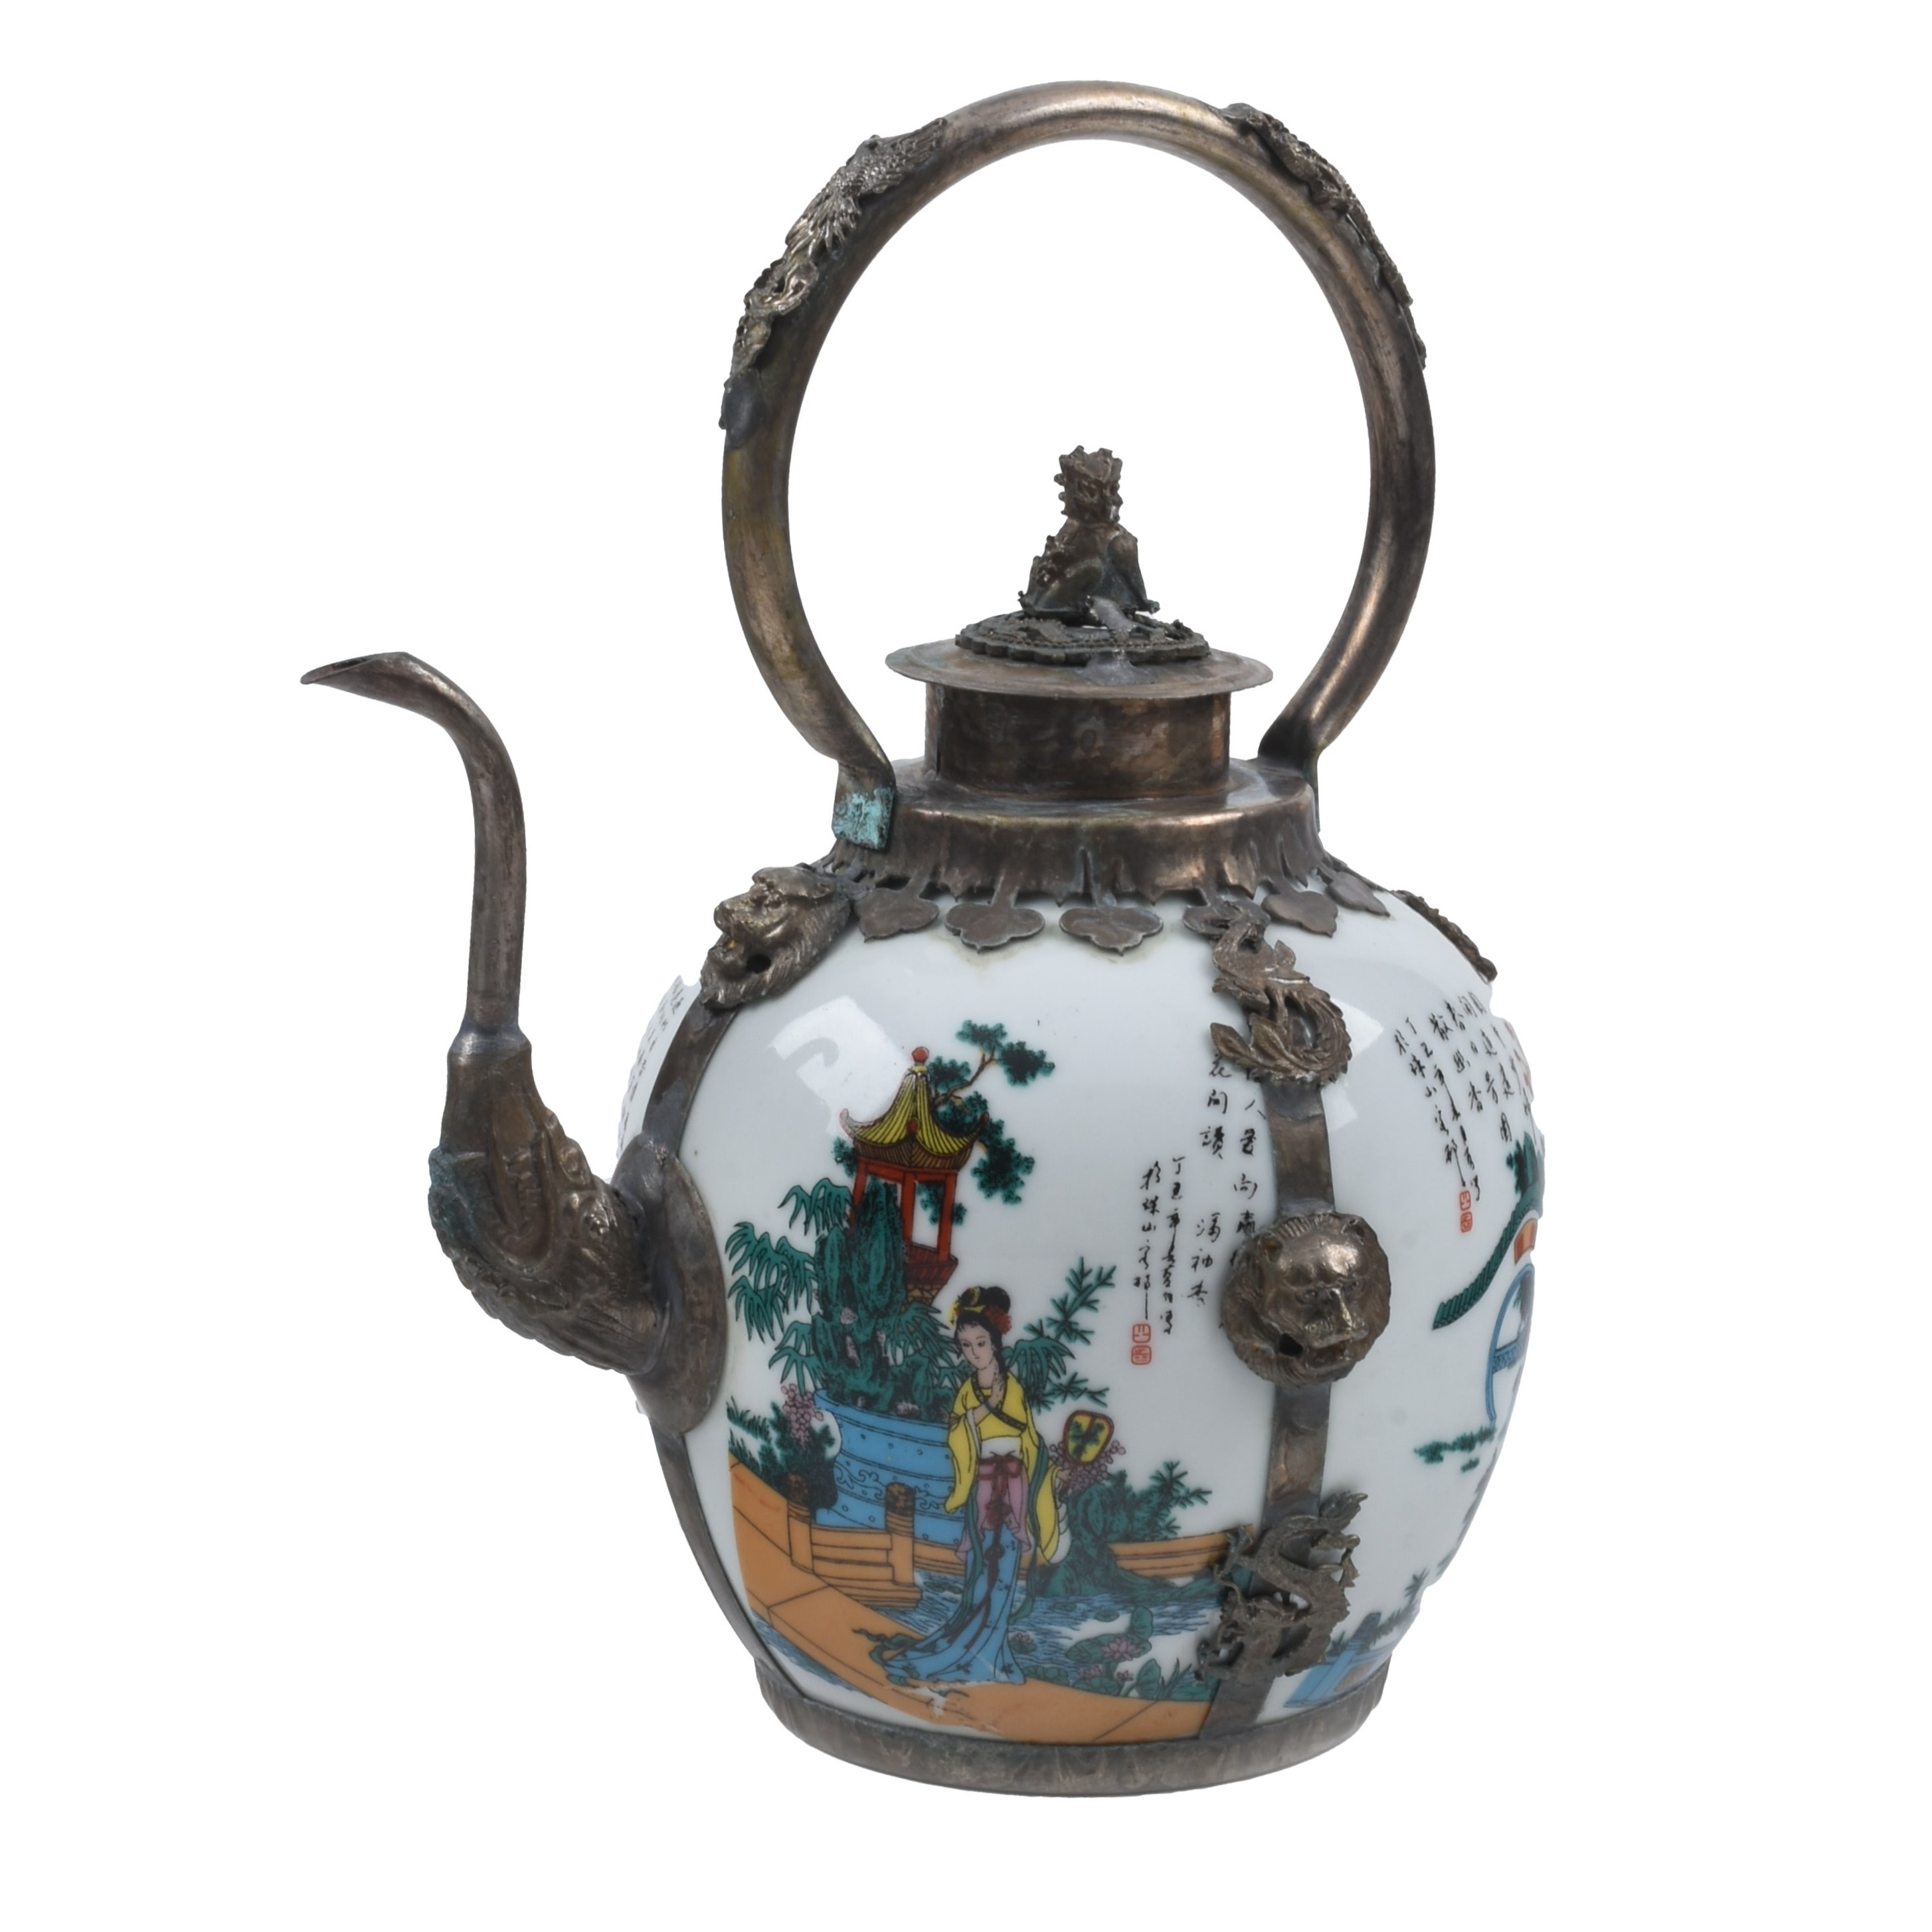 Antique Tibet Porcelain and White Metal Teapot